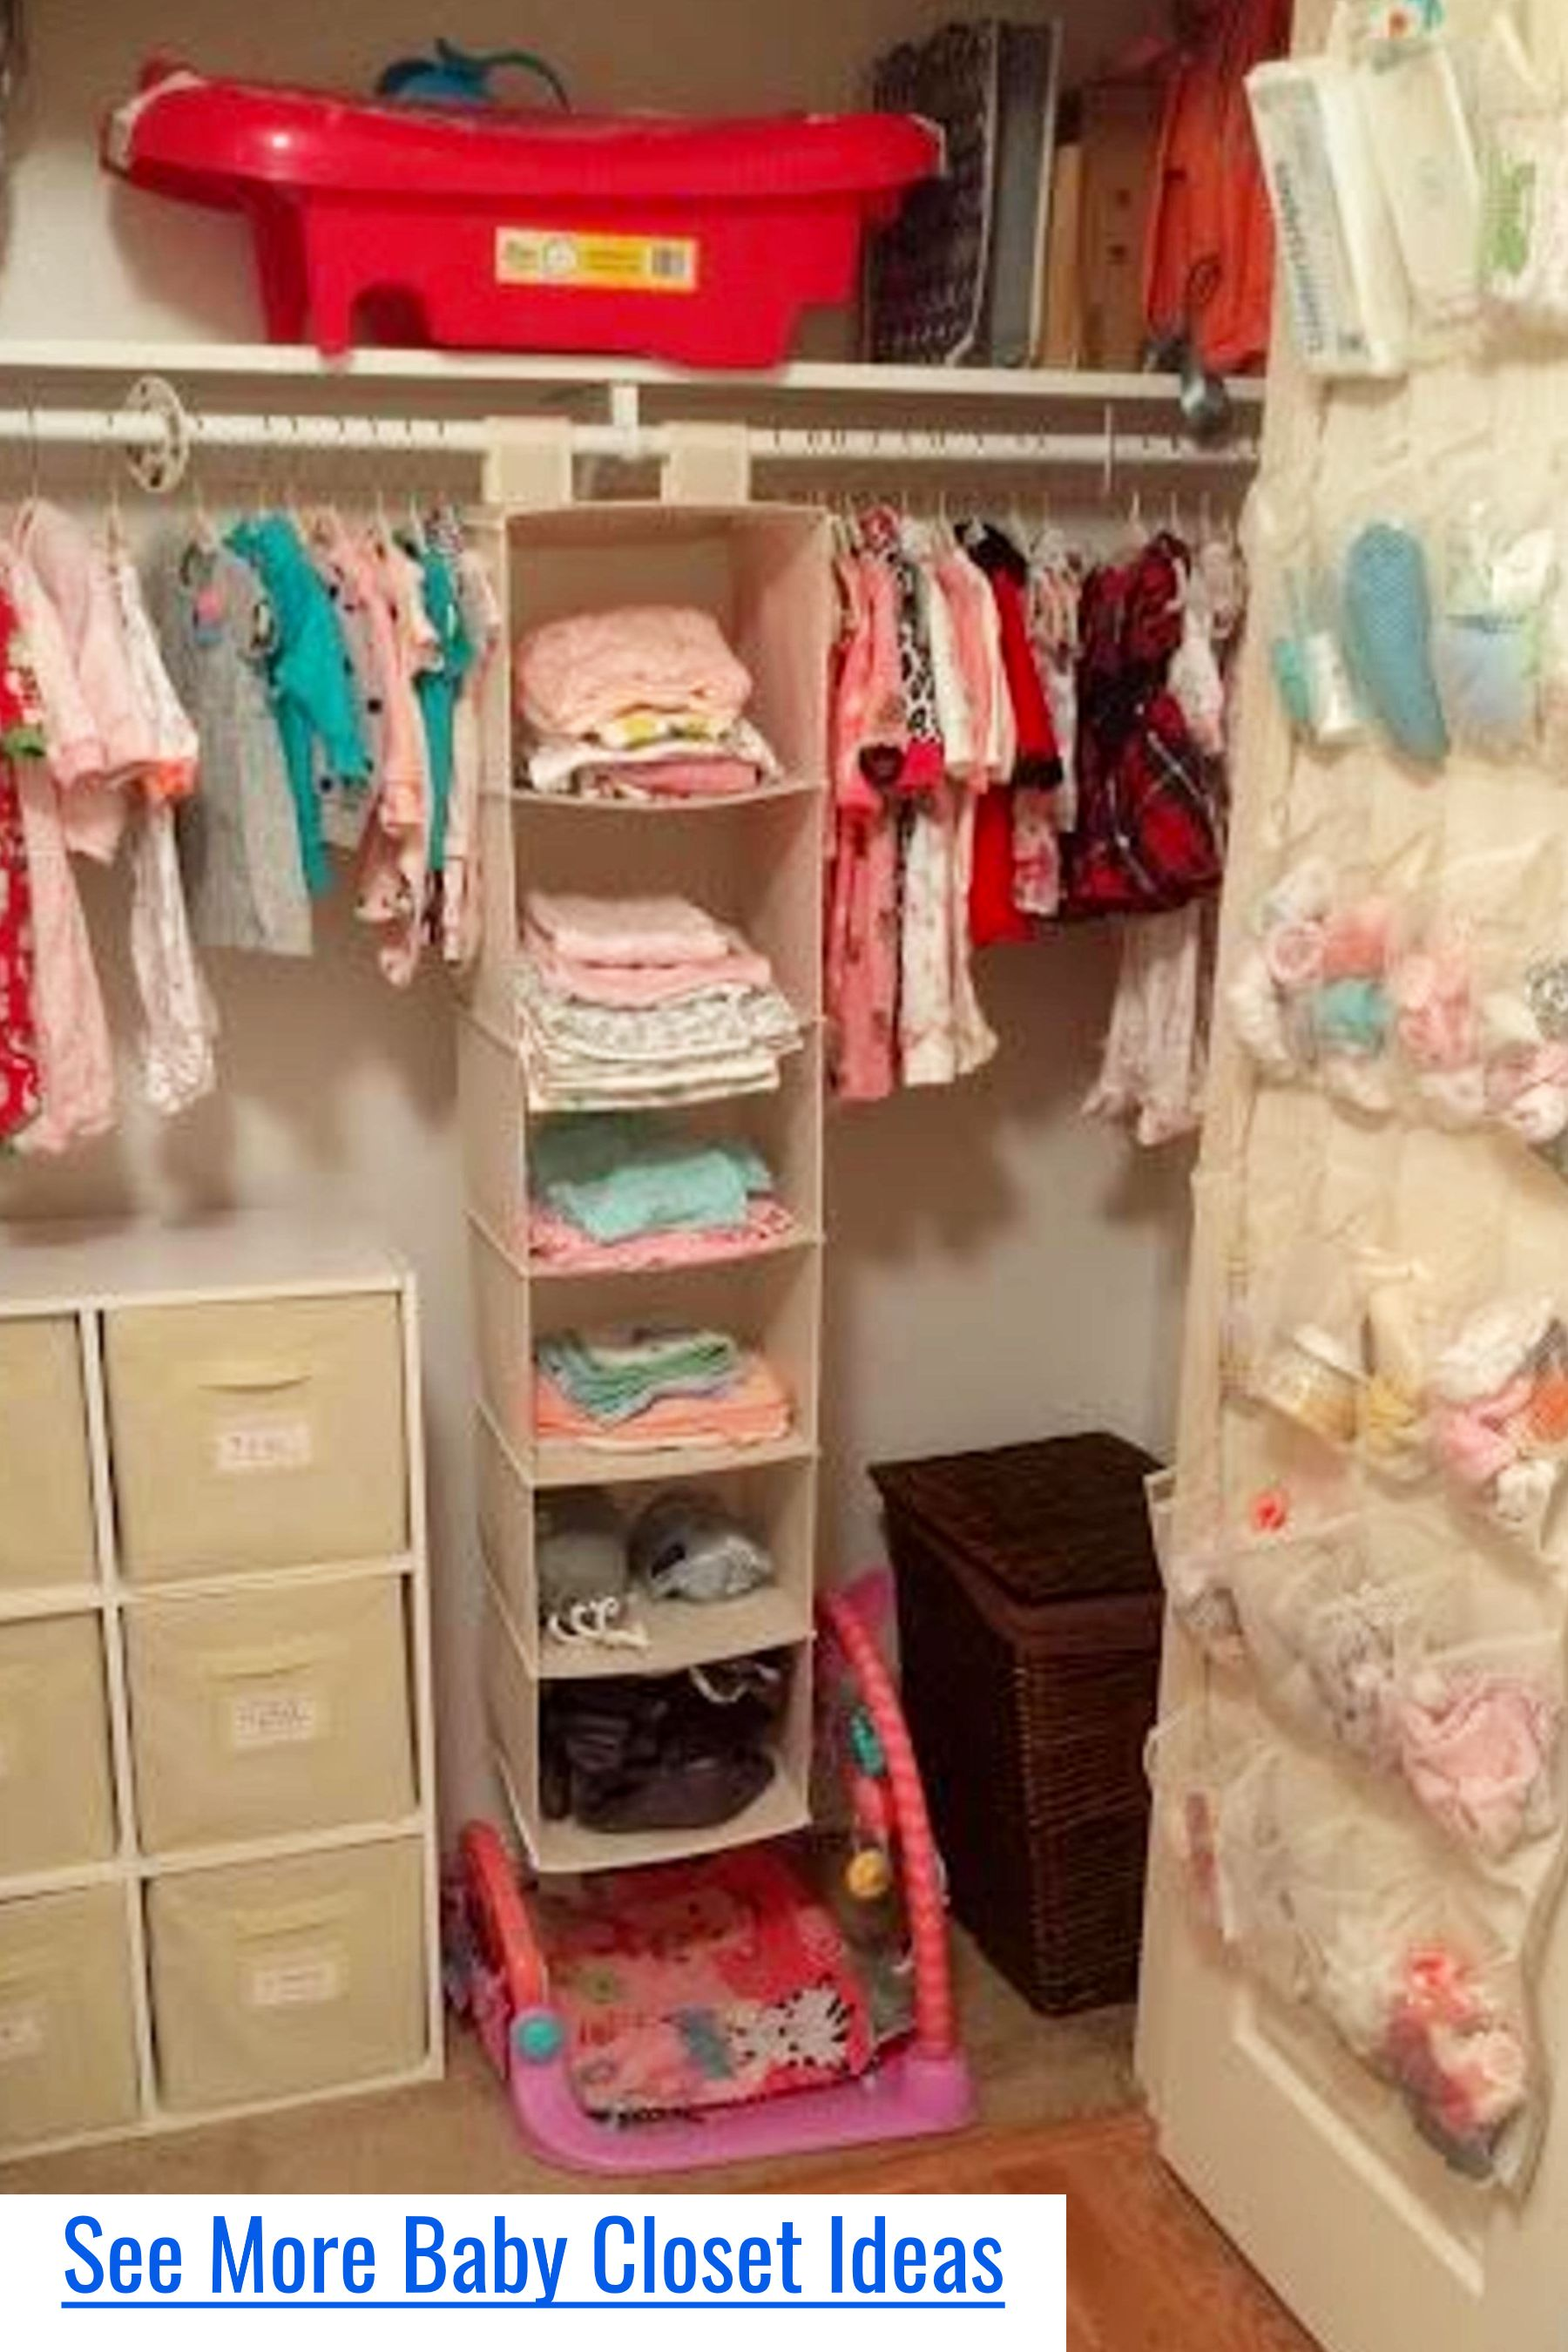 Baby Closet Ideas 47 Nursery Closet Organization Storage And Baby Closet Organizer Ideas In 2020 Nursery Closet Organization Baby Closet Organization Baby Room Organization